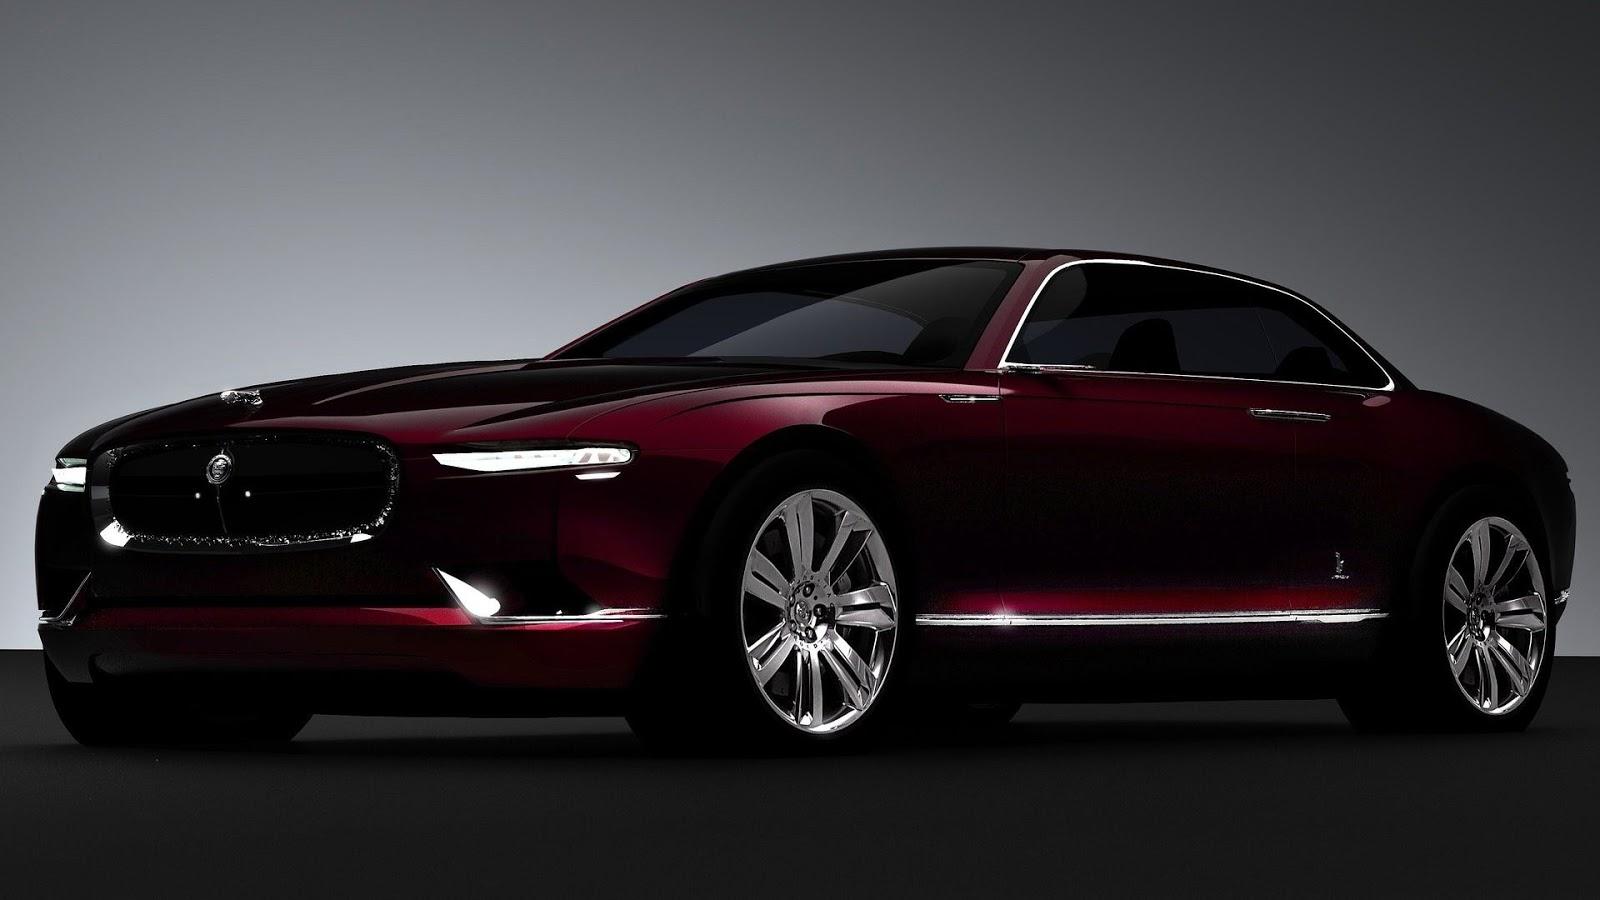 Attractive Jaguar Car Wallpaper Hd. Black Beauty Nice Ideas